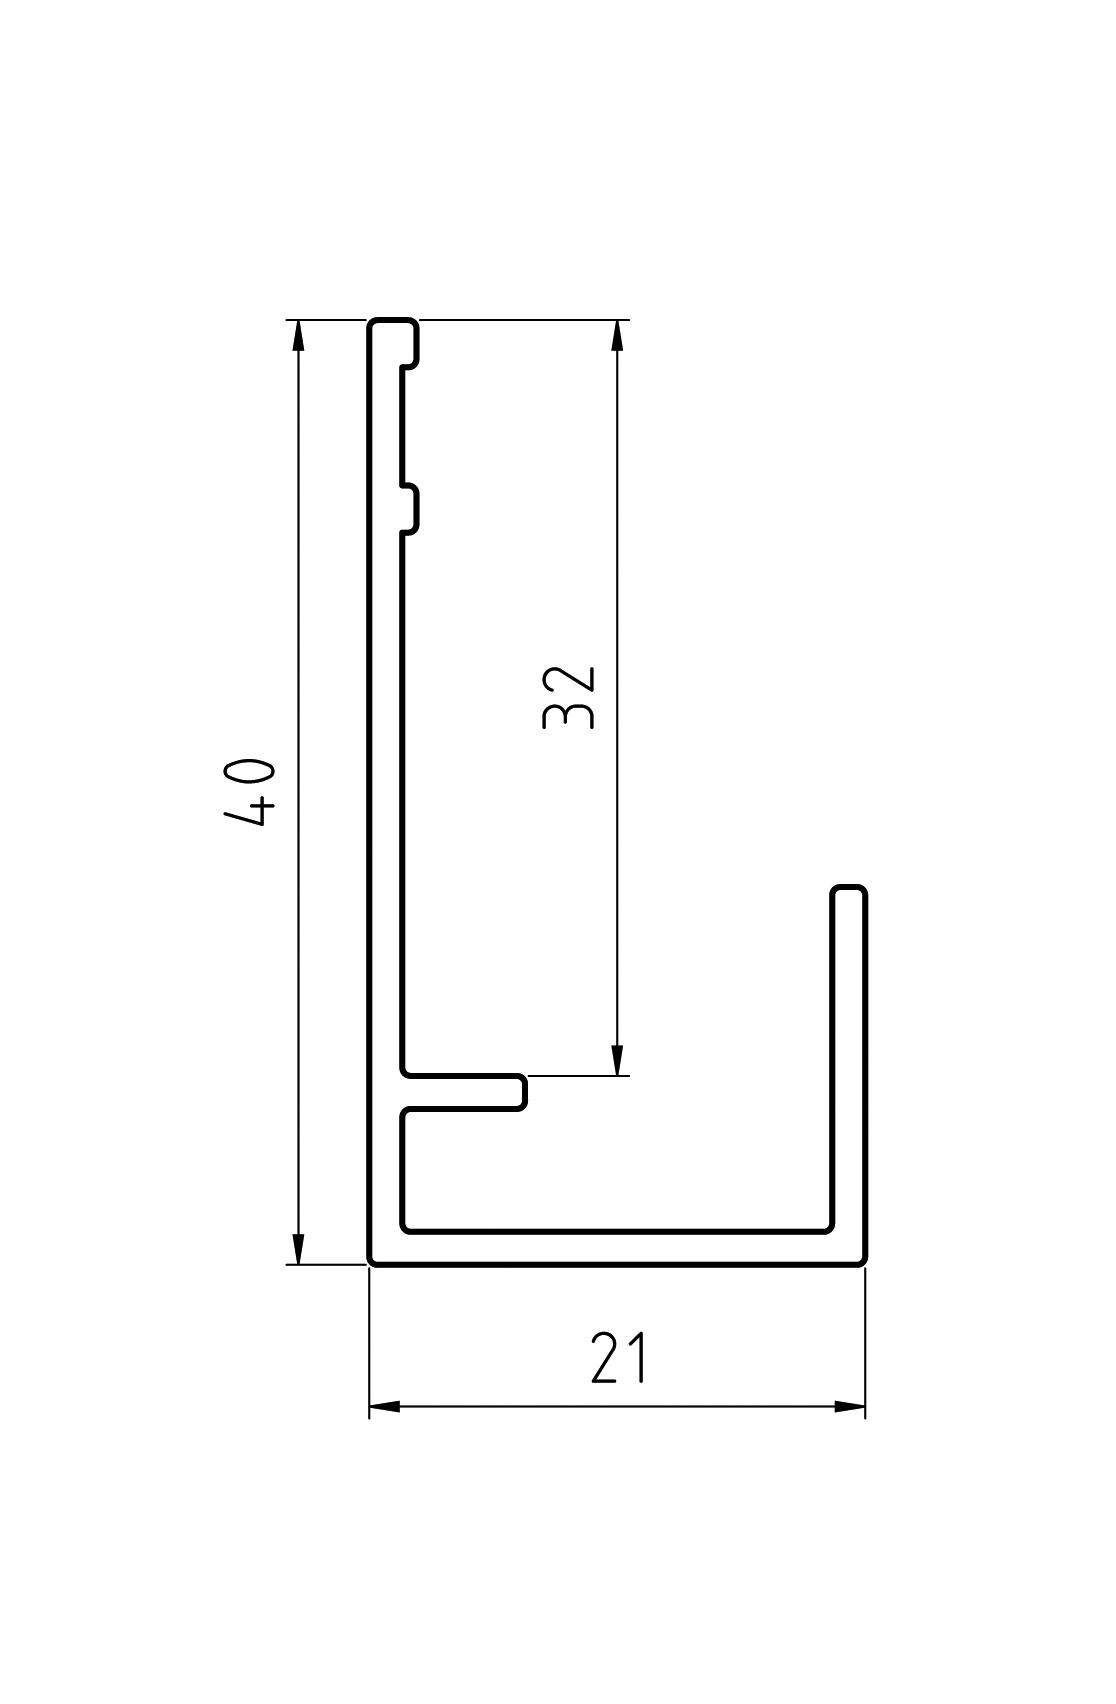 Gevelit Aluminium Startprofiel Antraciet 7016 Verticaal l=4m